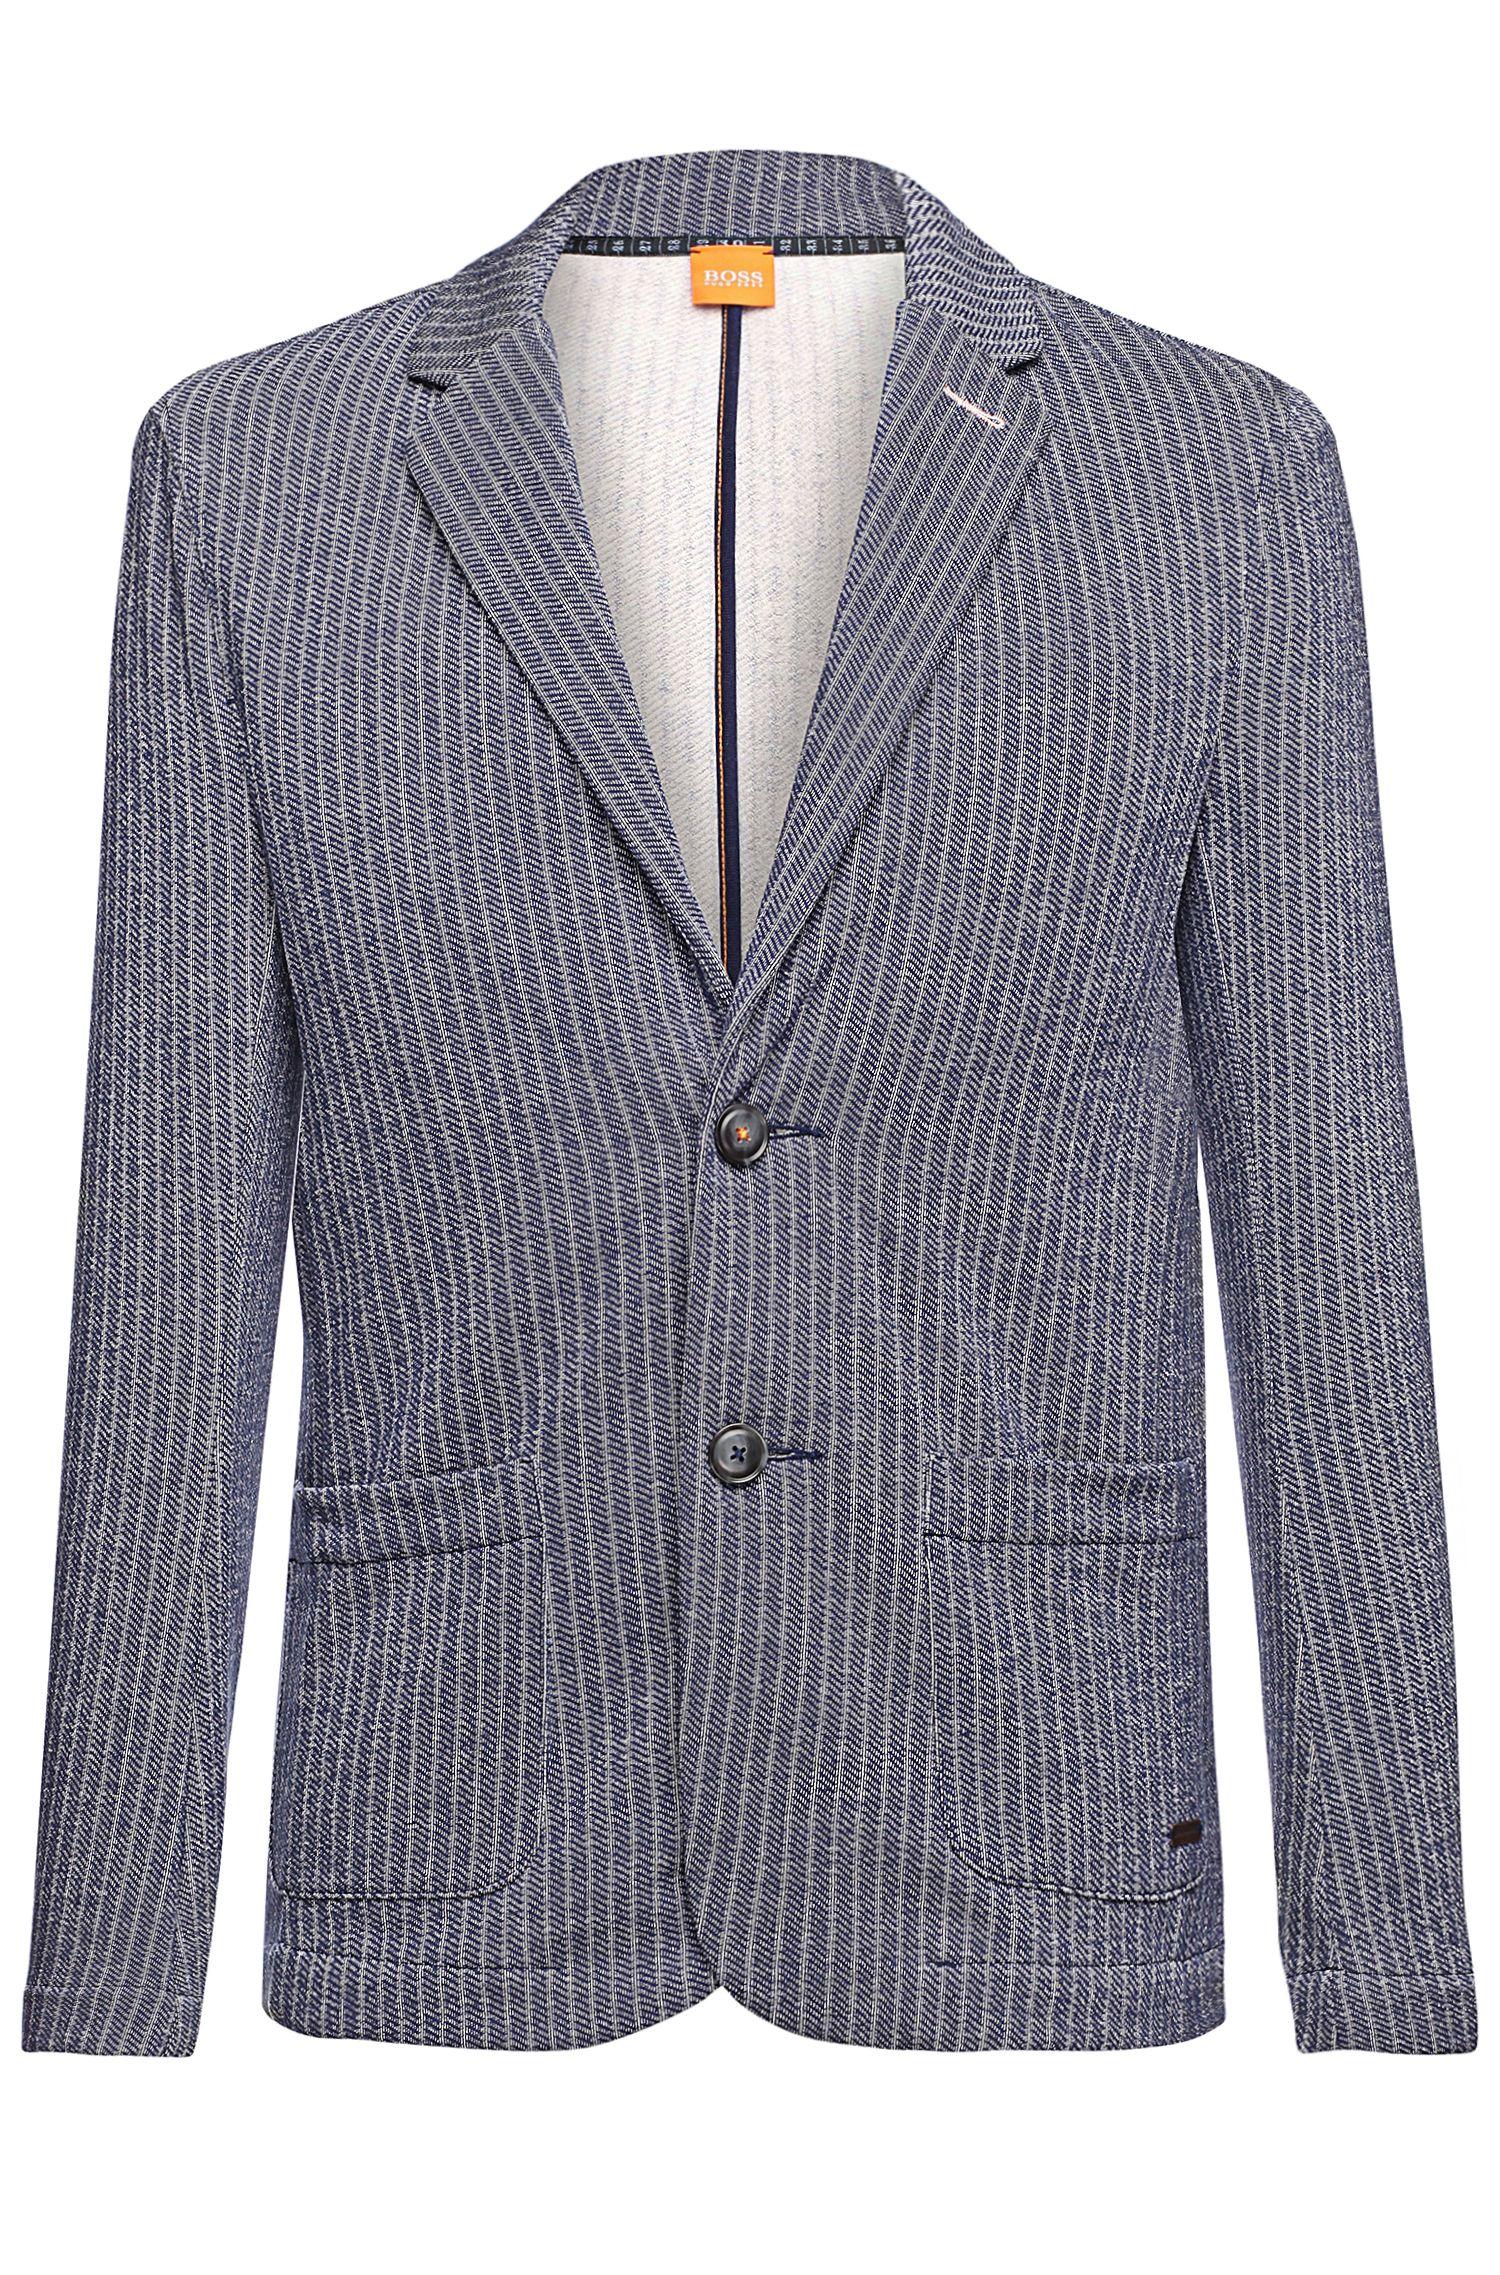 'Wallentin' | Slim Fit, Soft Terry Sport Coat